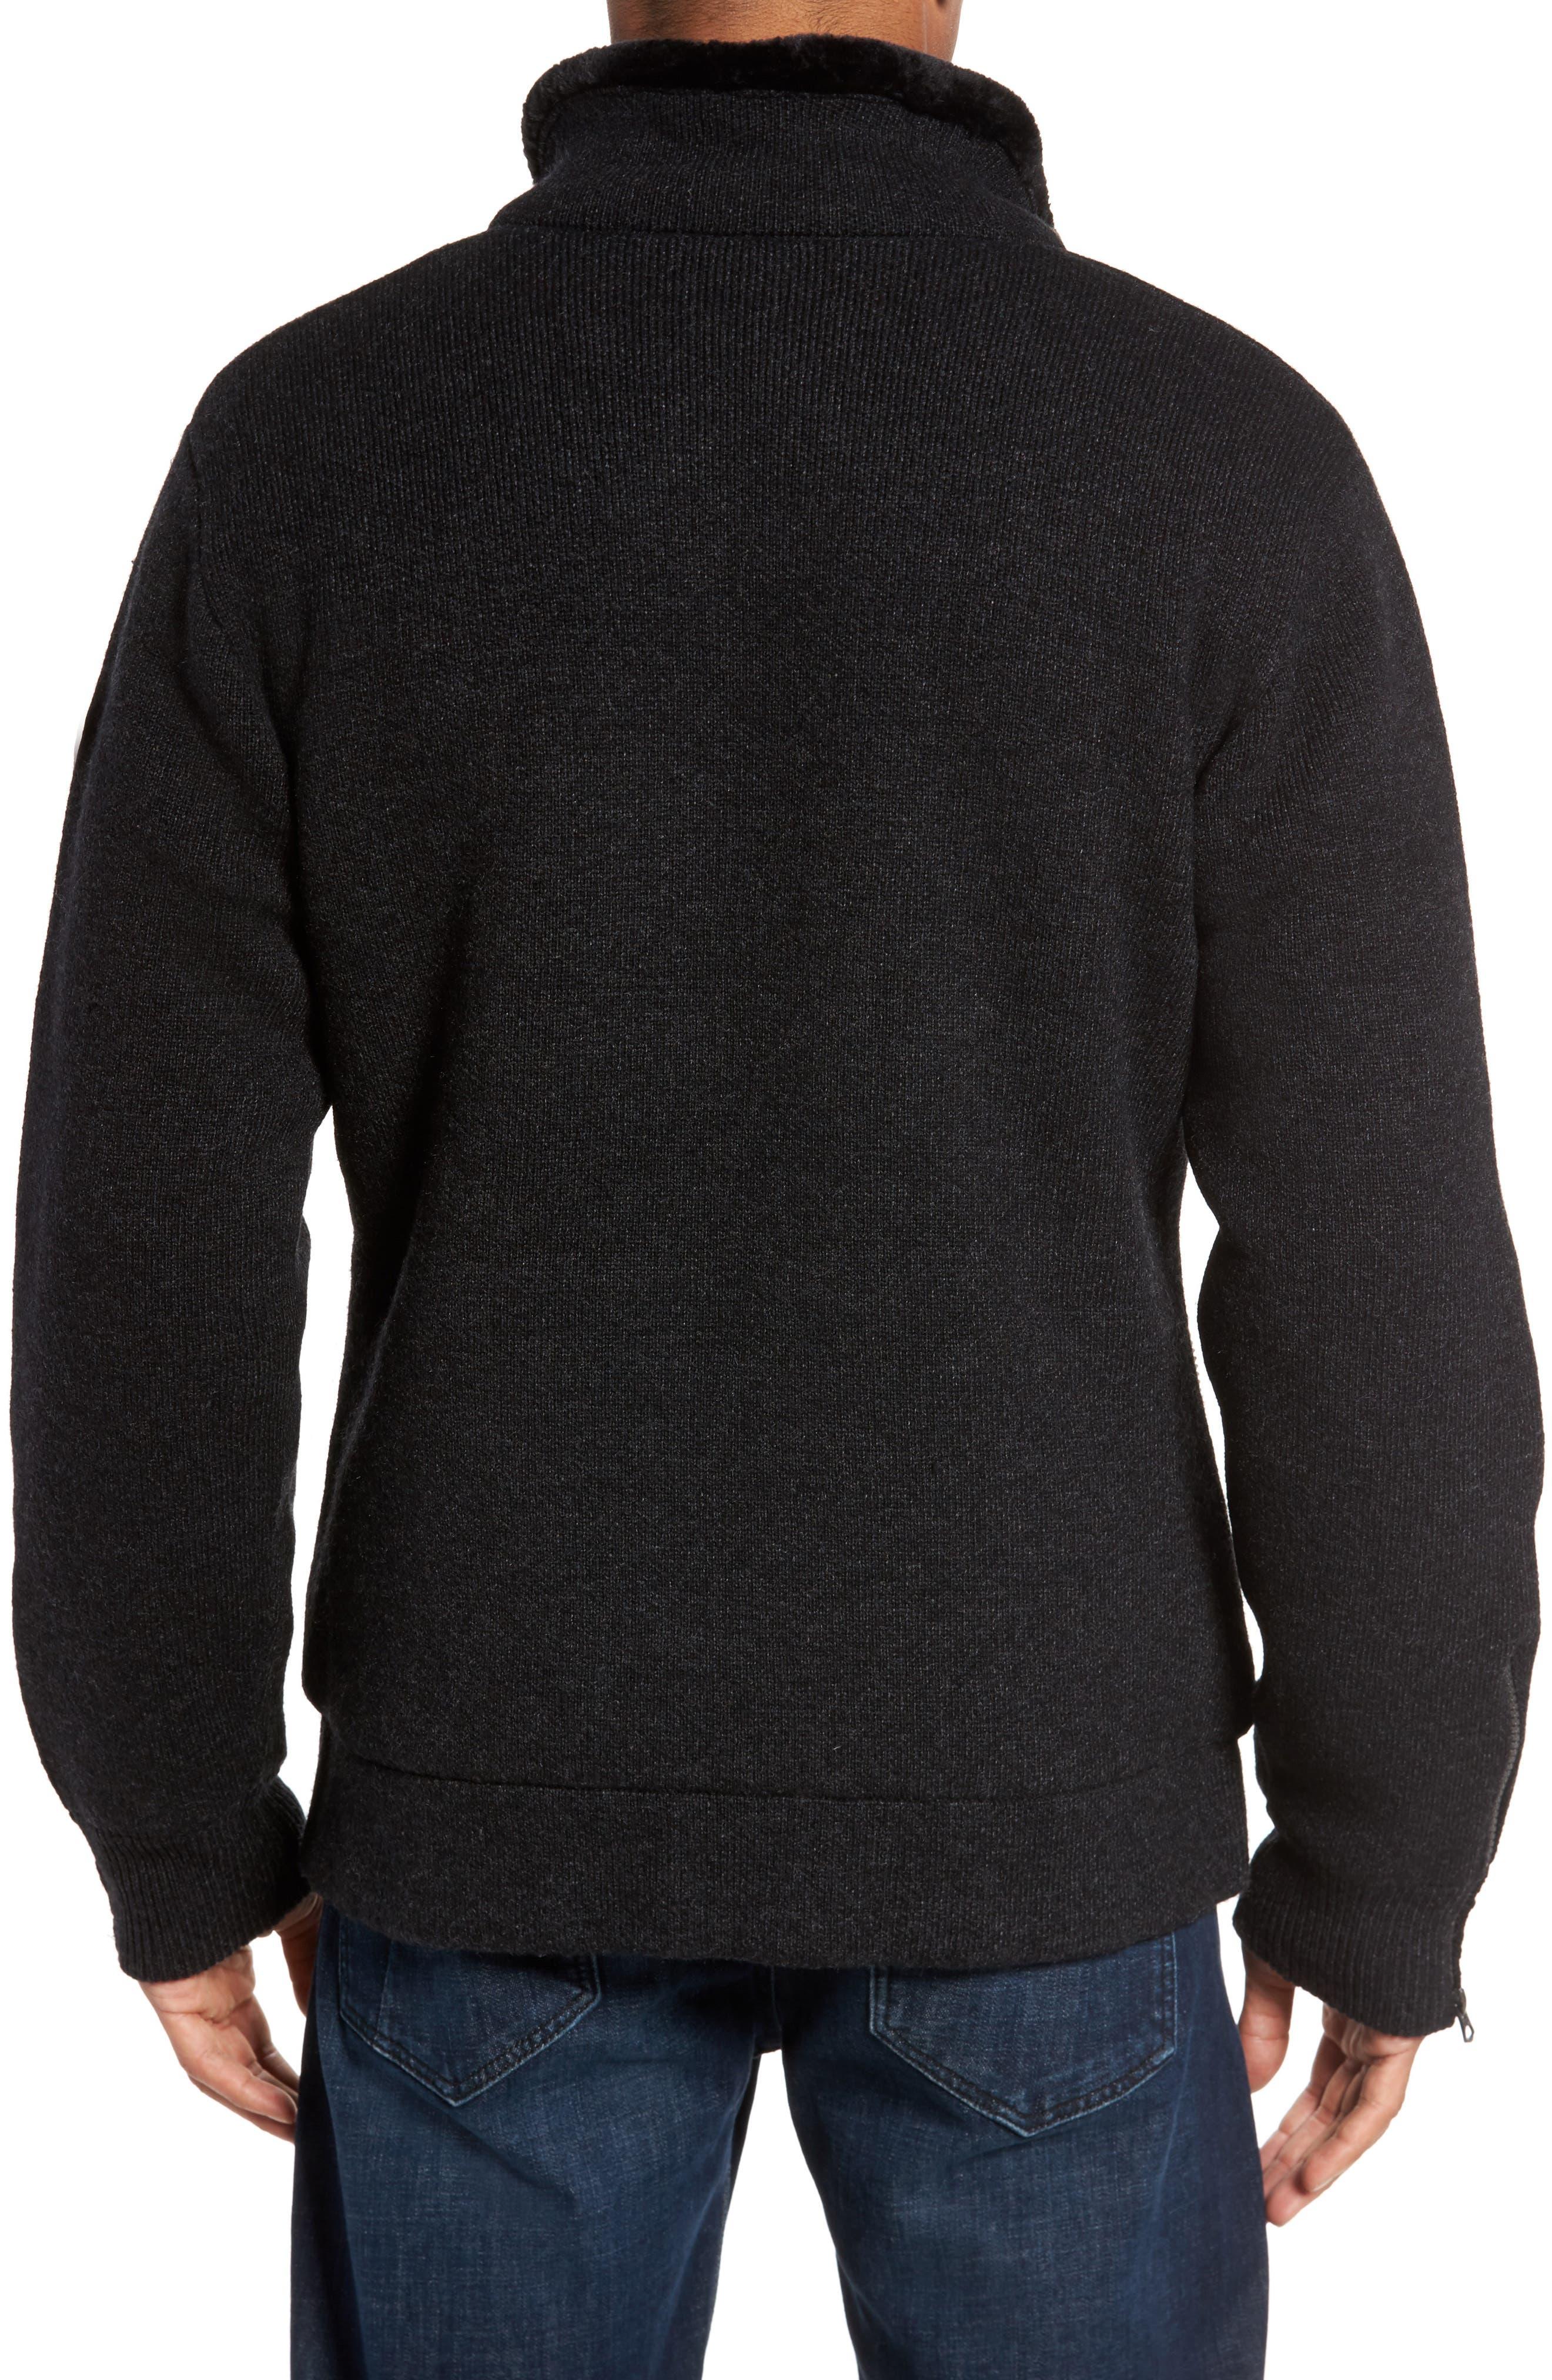 Caf Faux Fur Lined Sweater Jacket,                             Alternate thumbnail 2, color,                             BLACK